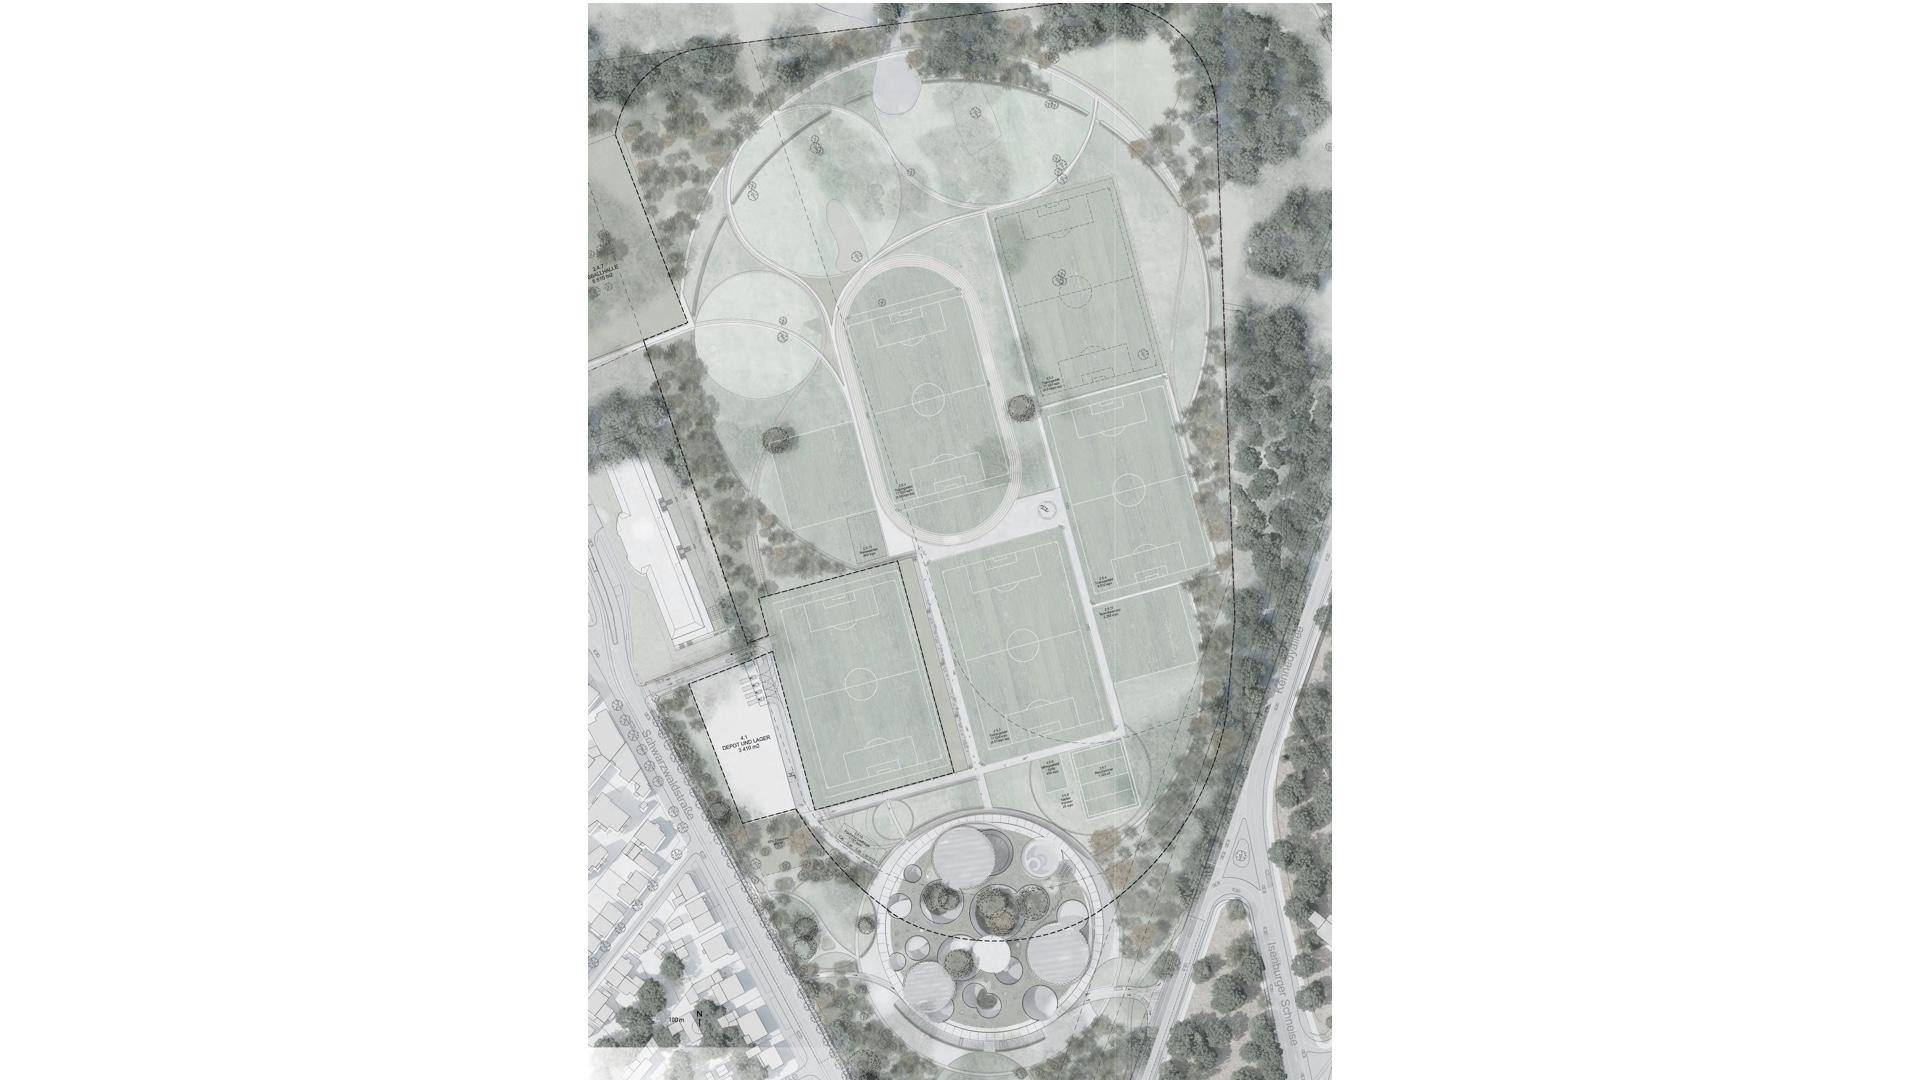 Djao-Rakitine Deutscher Fussball-Bund Academy, Francfort